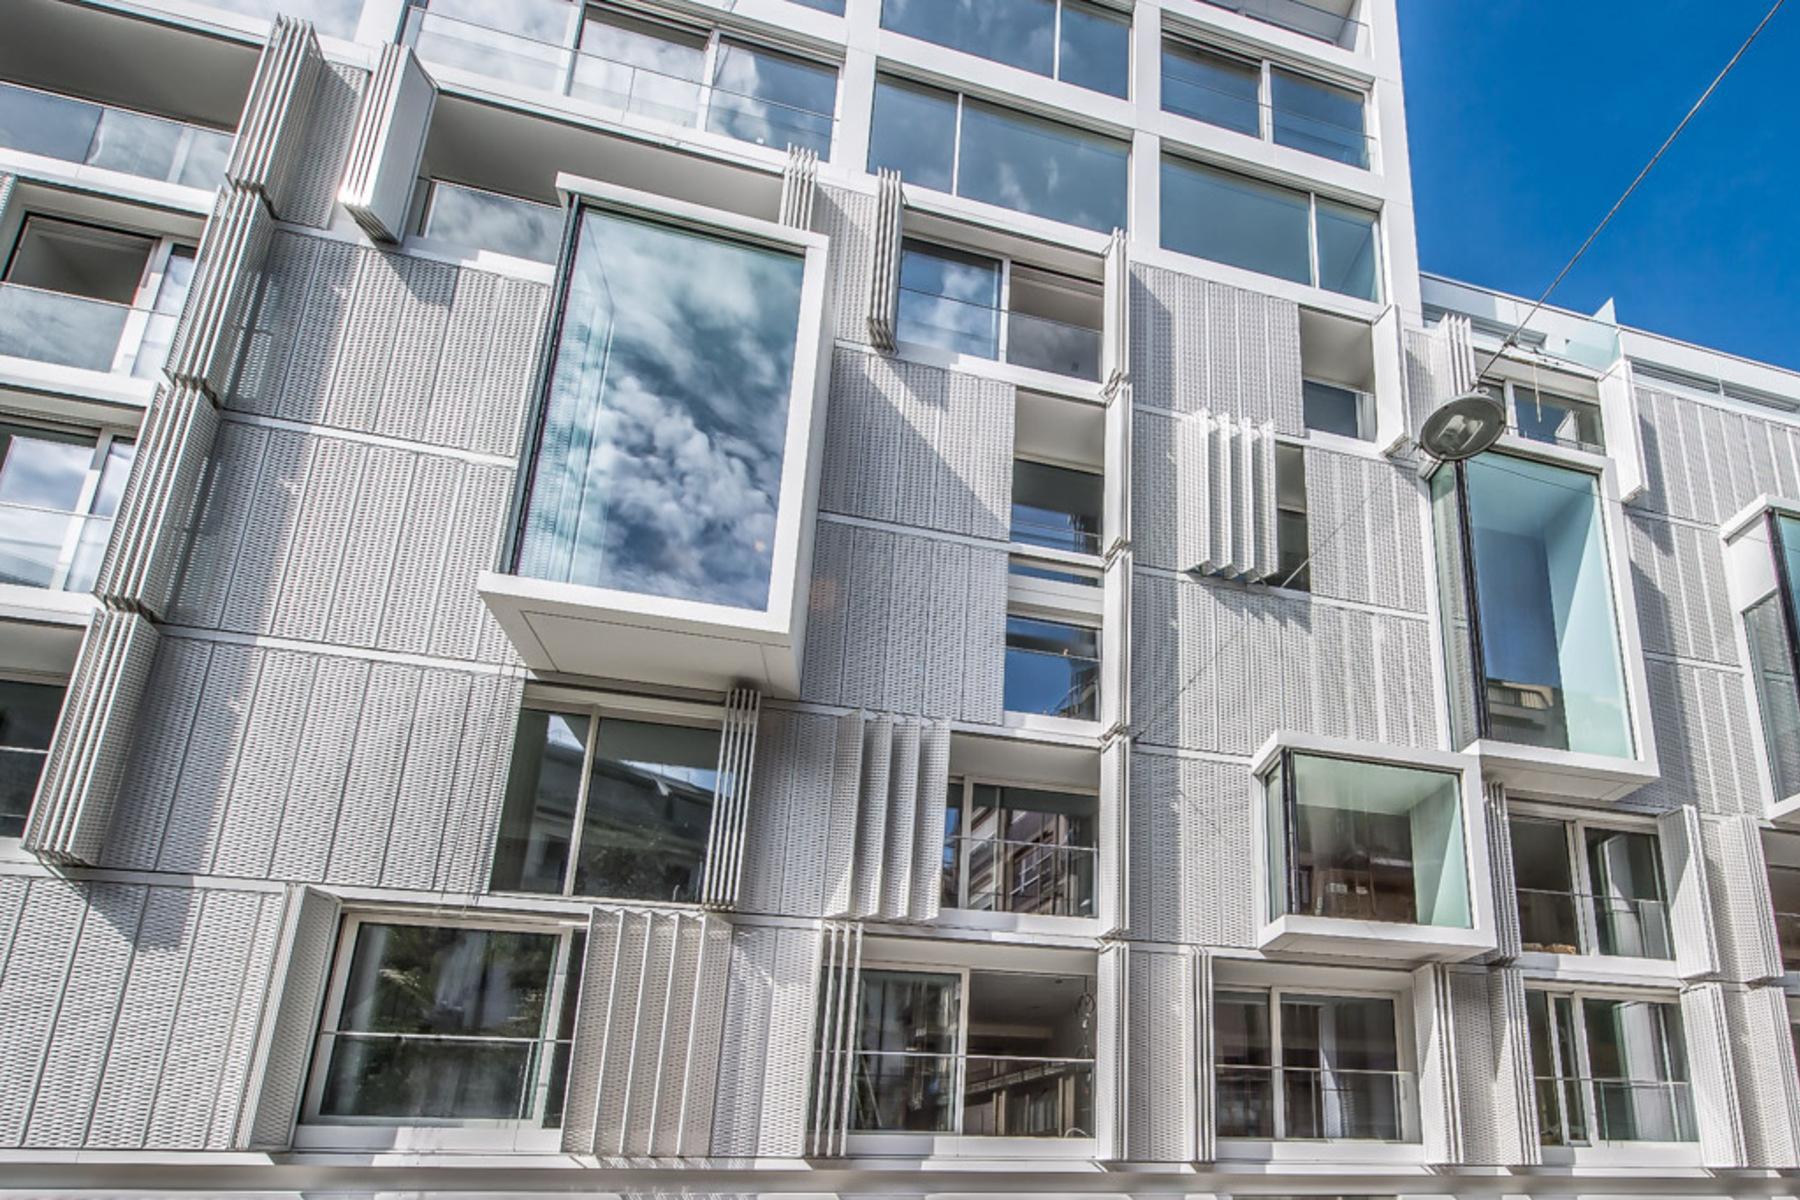 Duplex for Sale at Contemporary duplex located in a prestigious residence at the lake Genève Geneva, Geneva, 1201 Switzerland